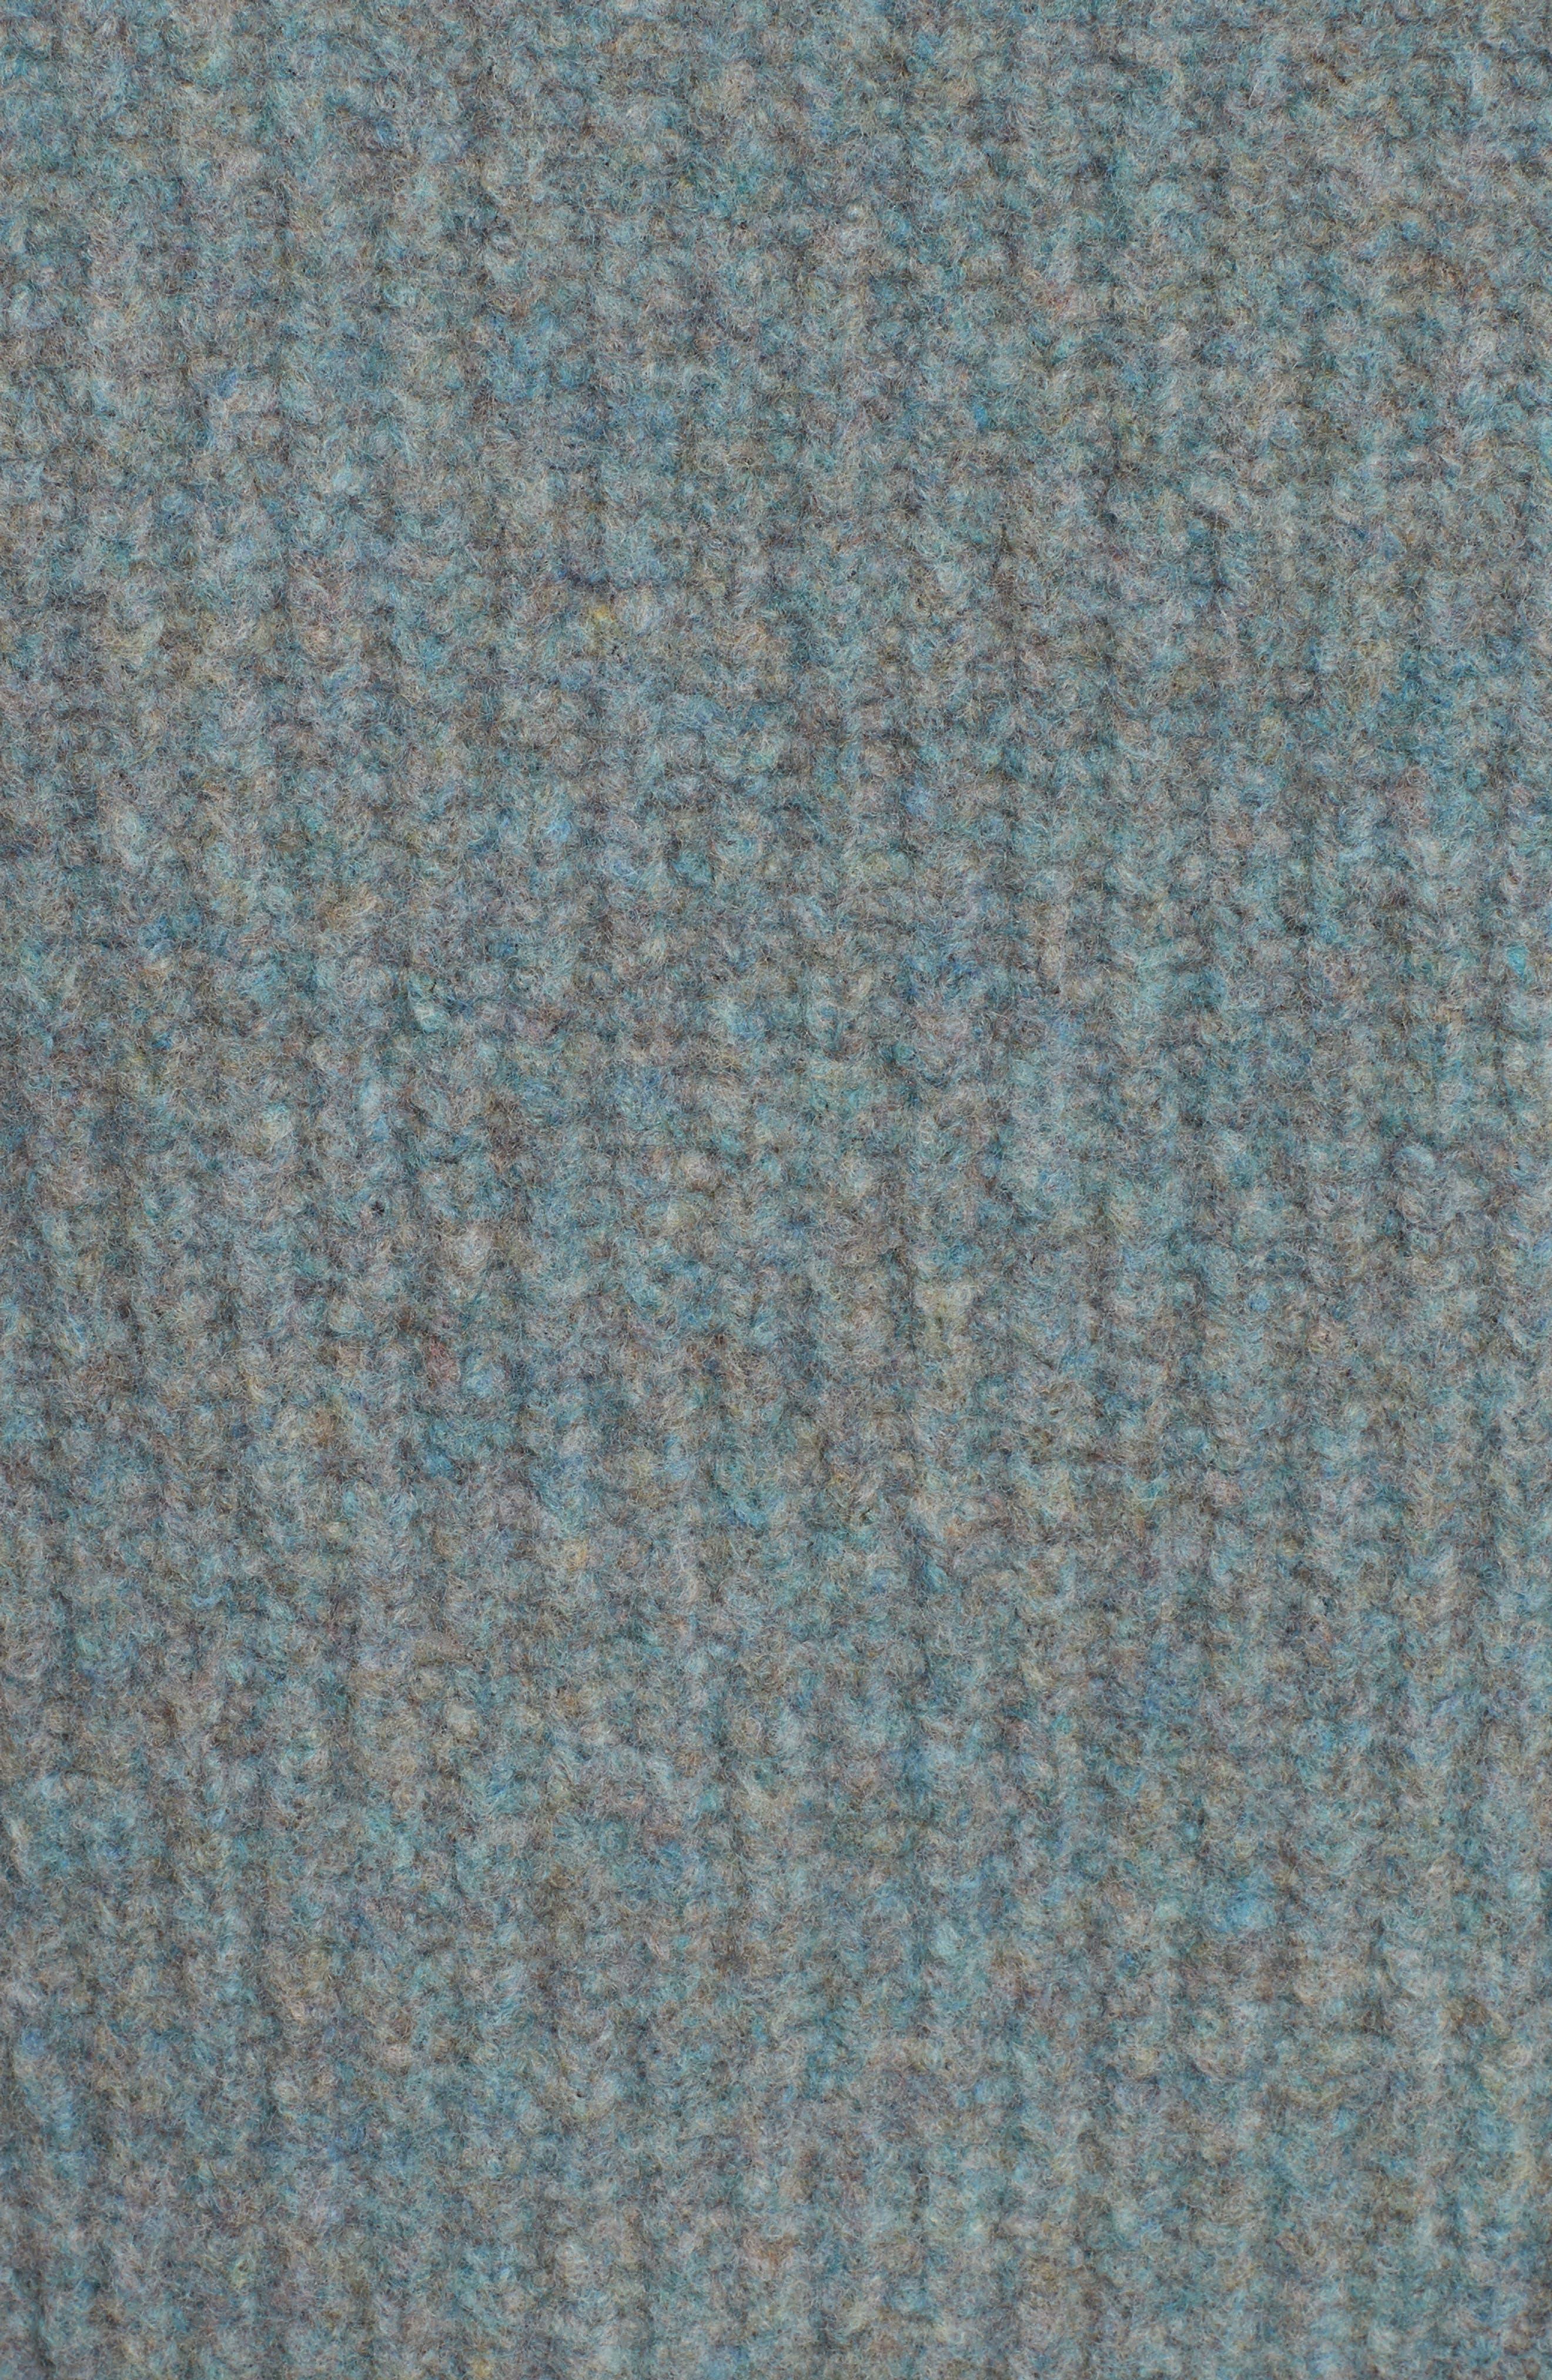 Francie Merino Wool Blend Sweater,                             Alternate thumbnail 5, color,                             Teal